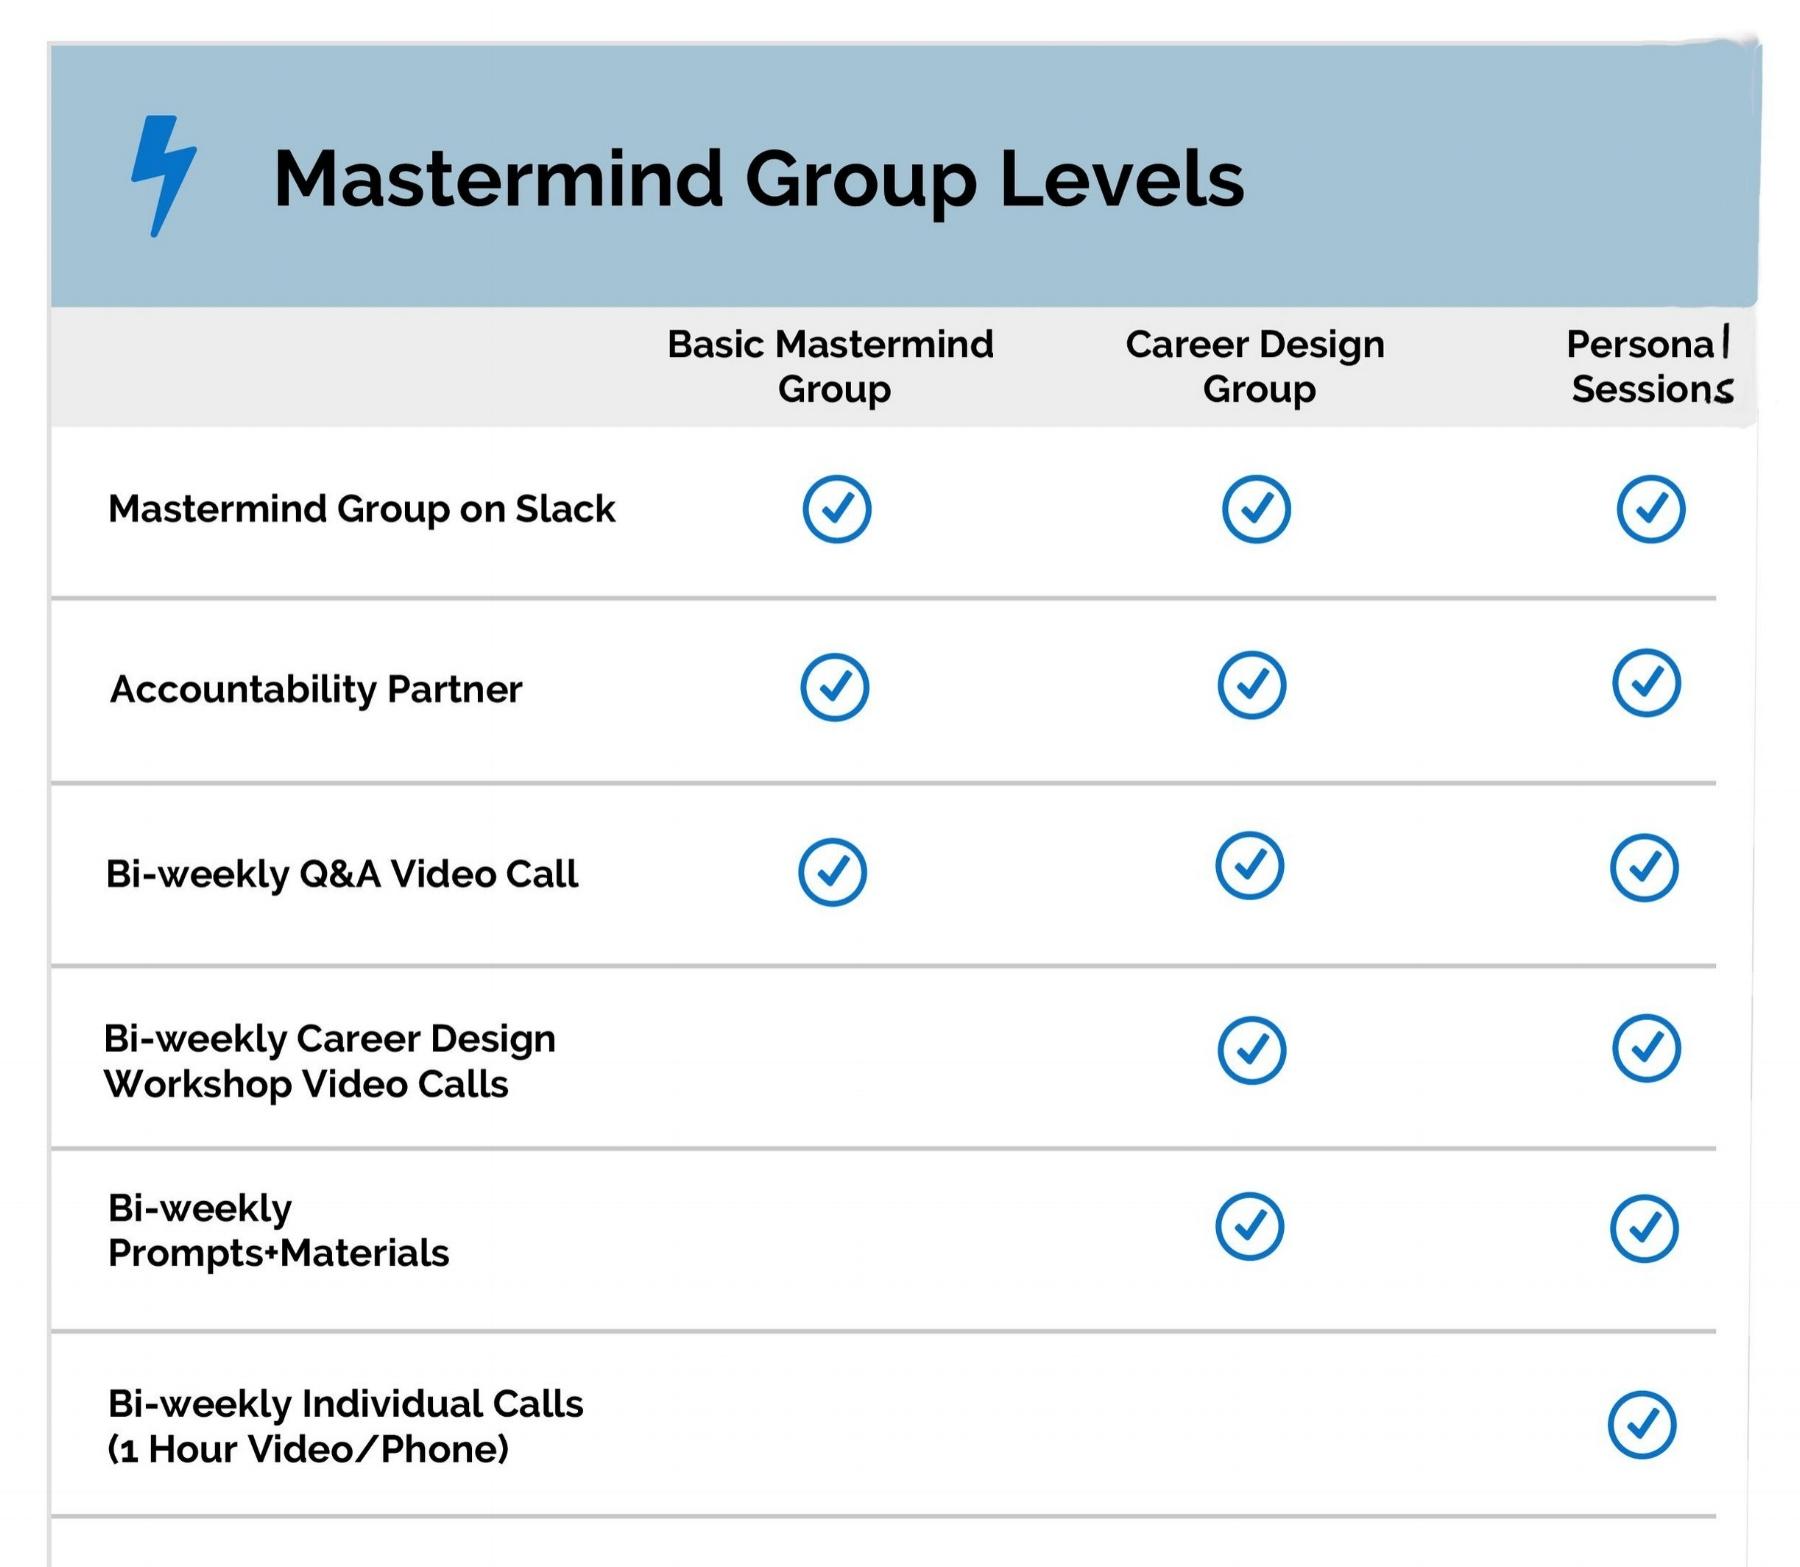 Mastermind Group Levels Clean Edited1.jpg